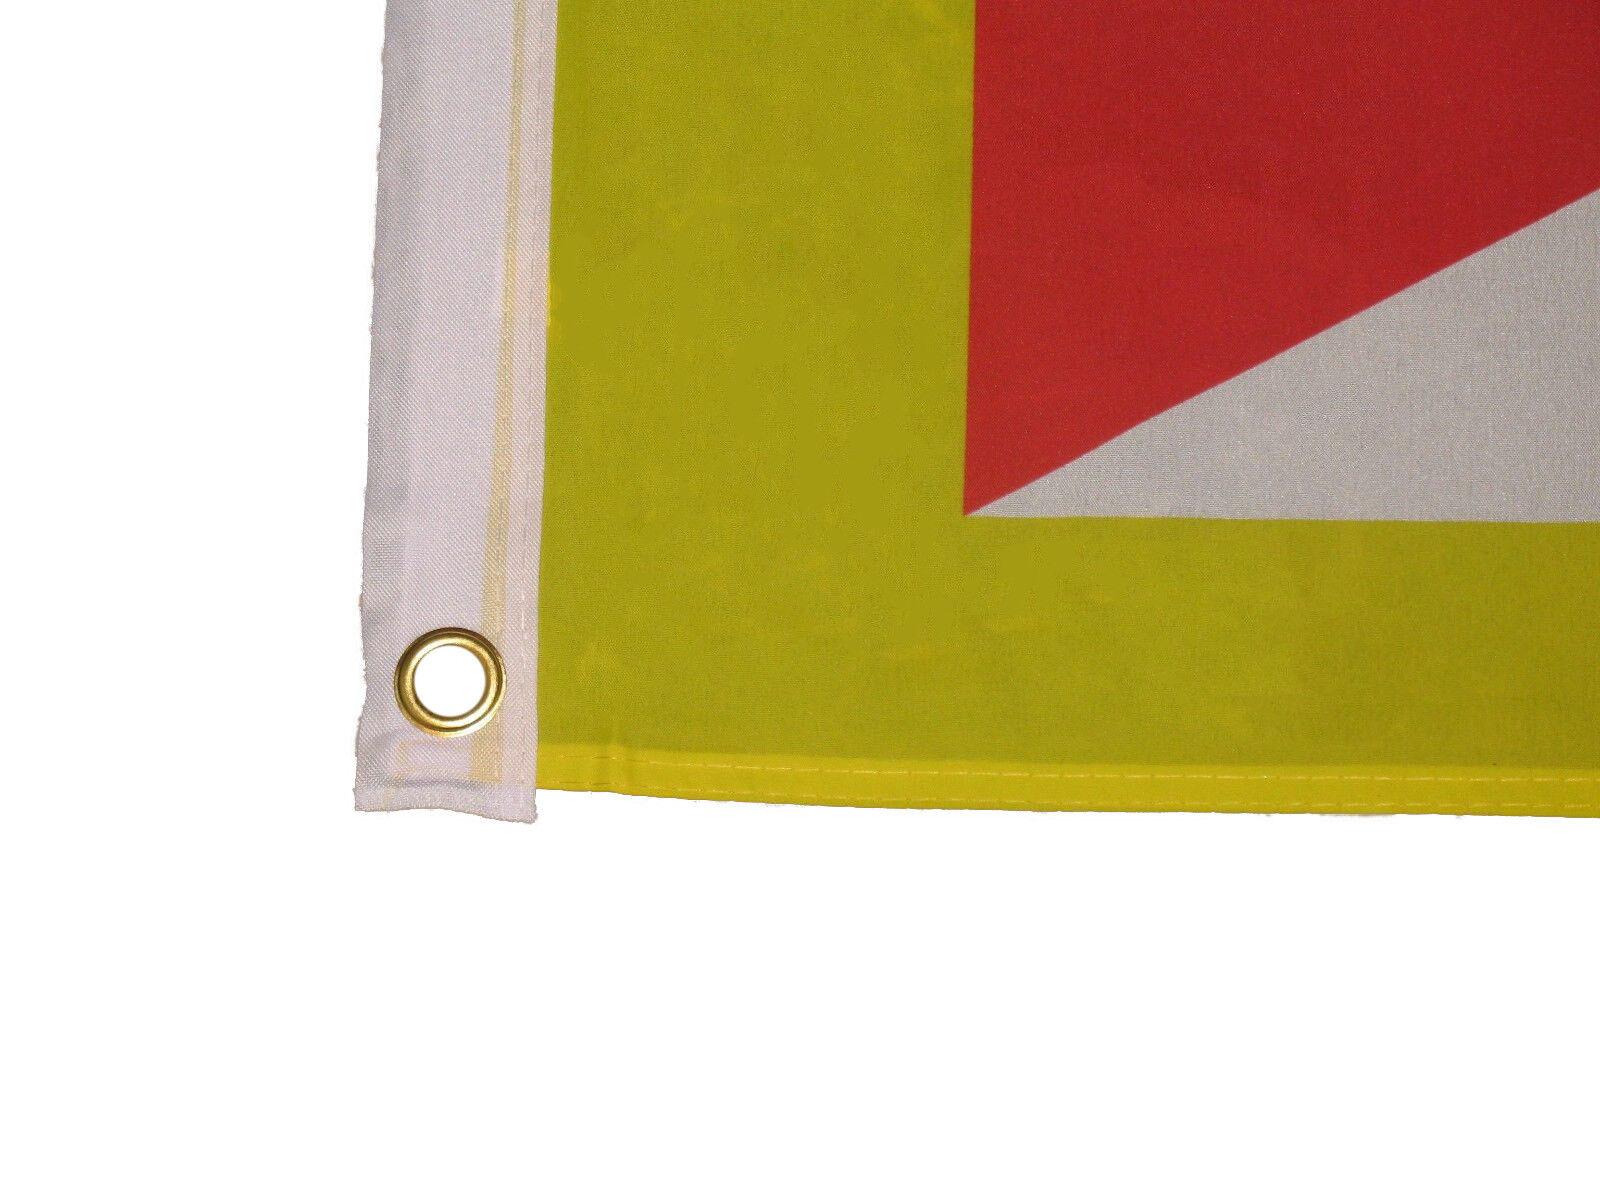 3x5 Tibet Chine Dalai Lama Tibetan flag 3/'x5/' House Banner Grommets